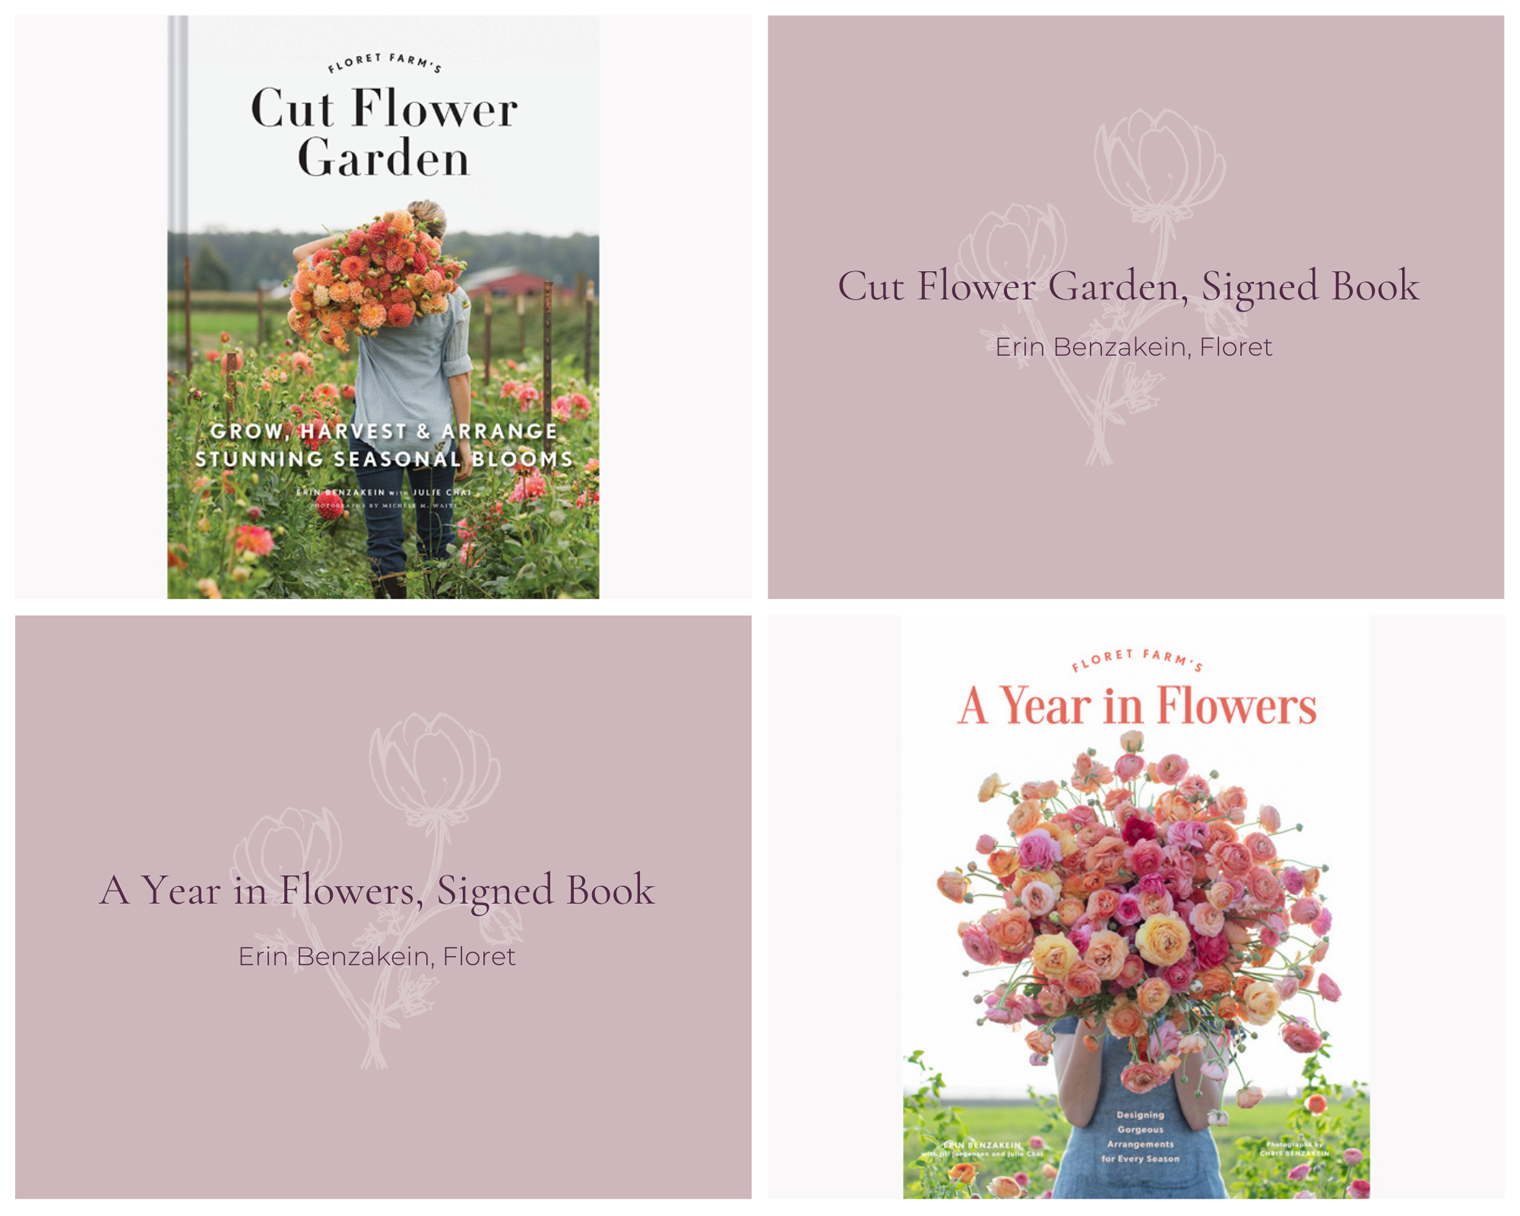 Flowerona's 10th Birthday Prize